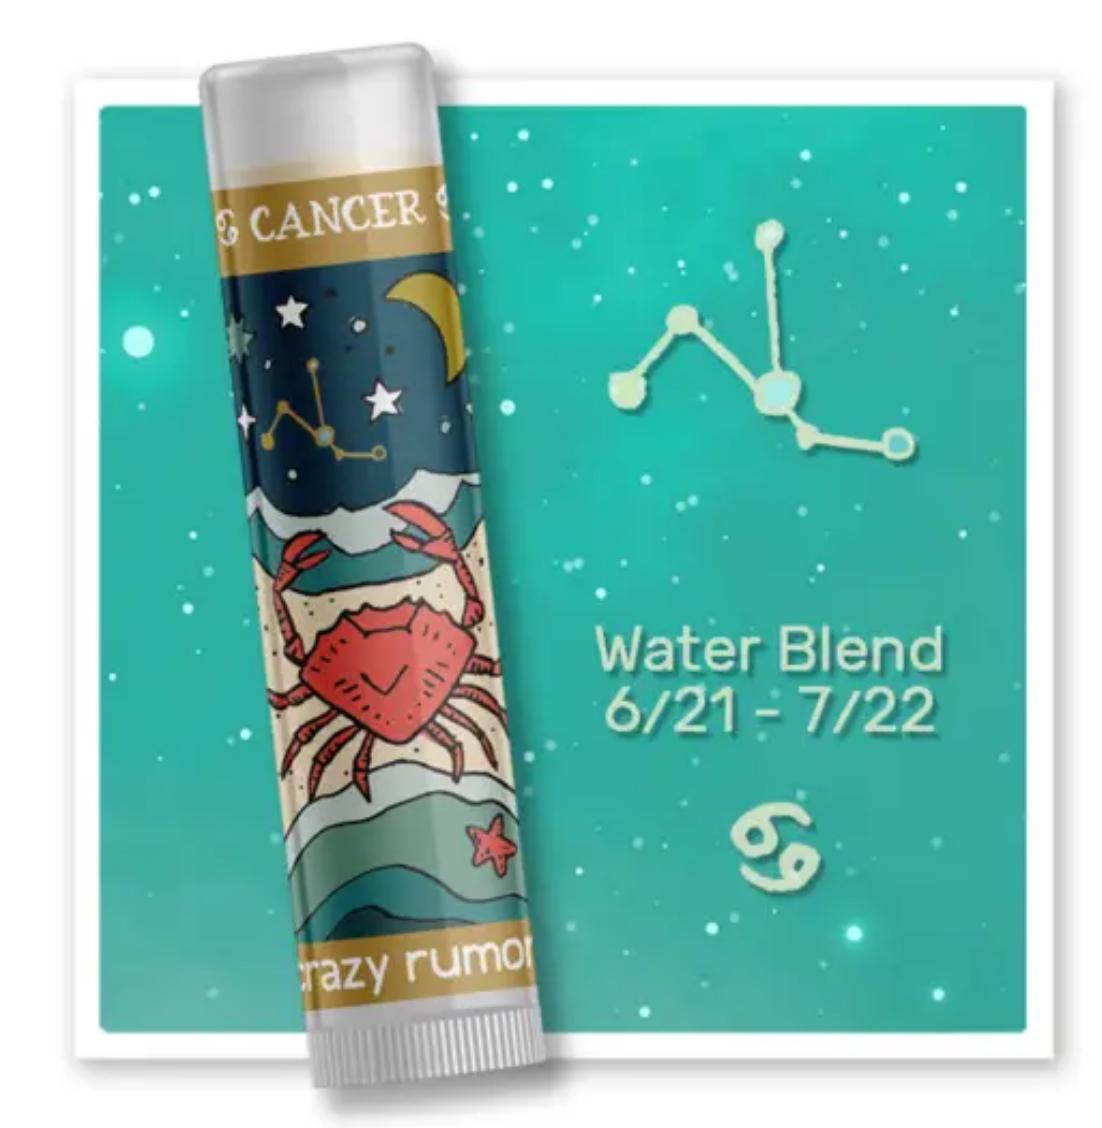 Crazy Rumors Cancer - Water Blend Lip Balm